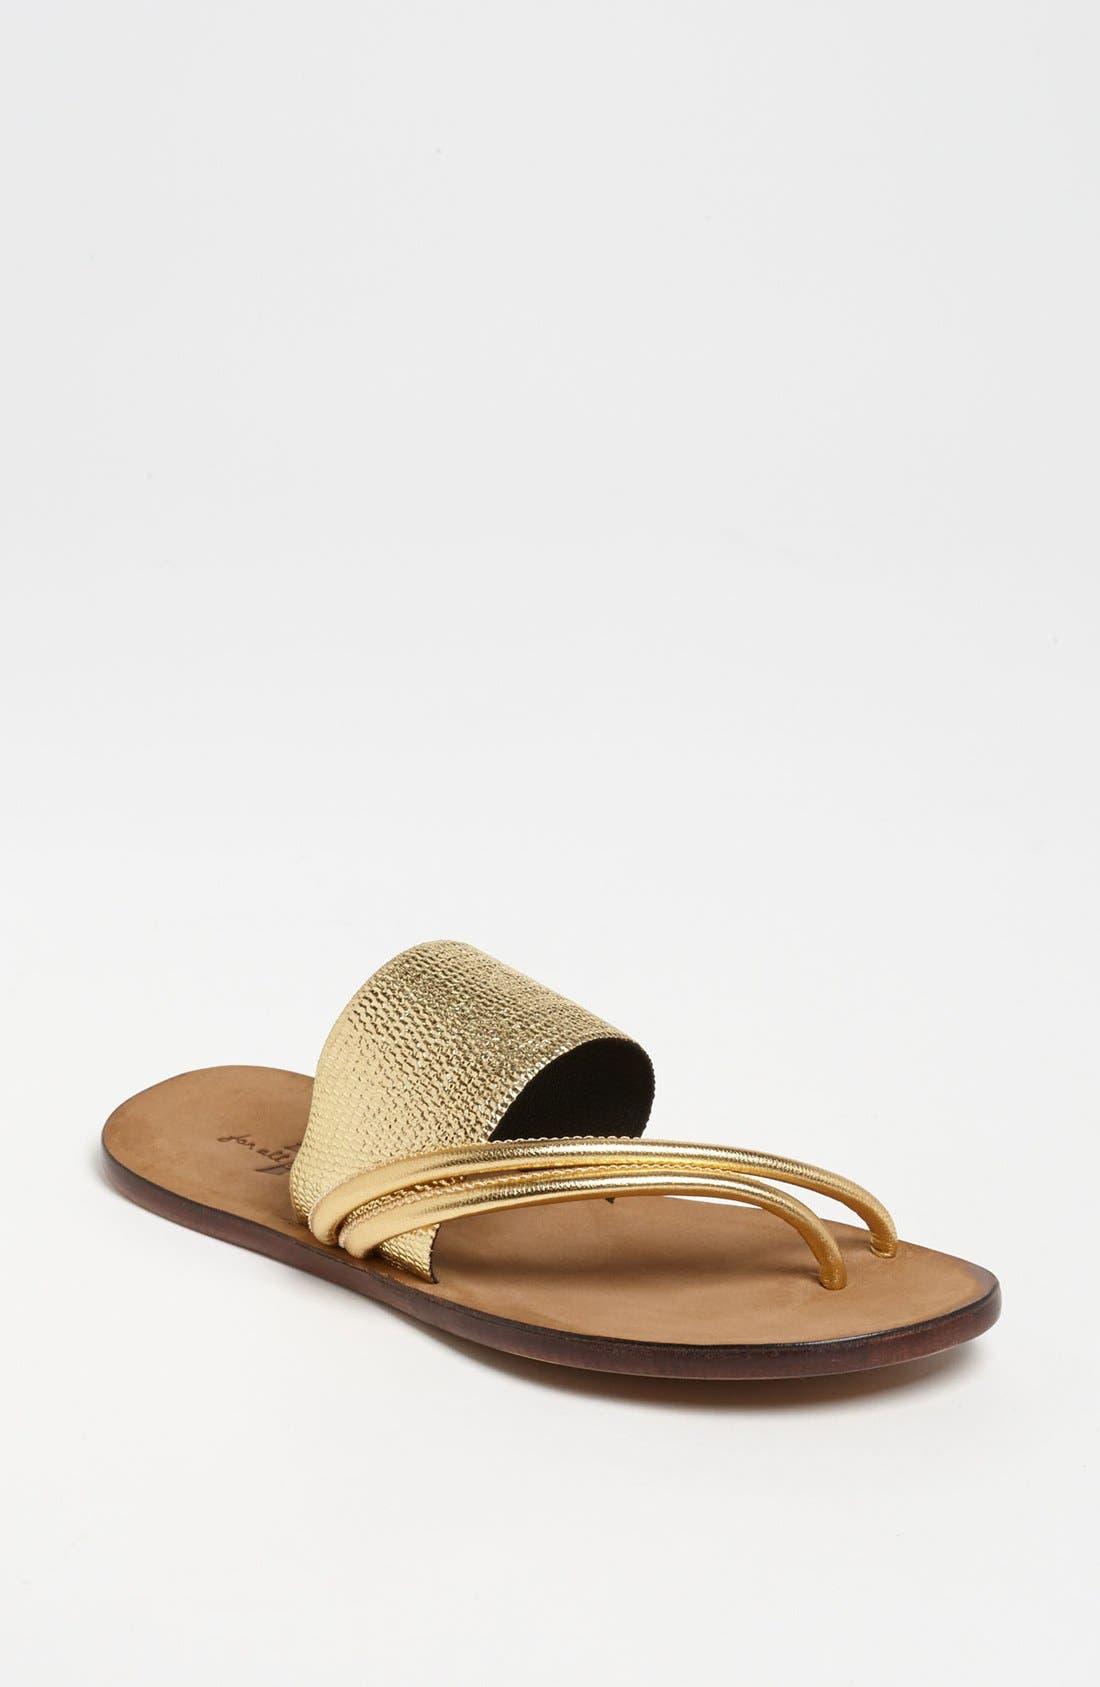 Main Image - 7 For All Mankind® 'Zaira' Sandal (Online Only)